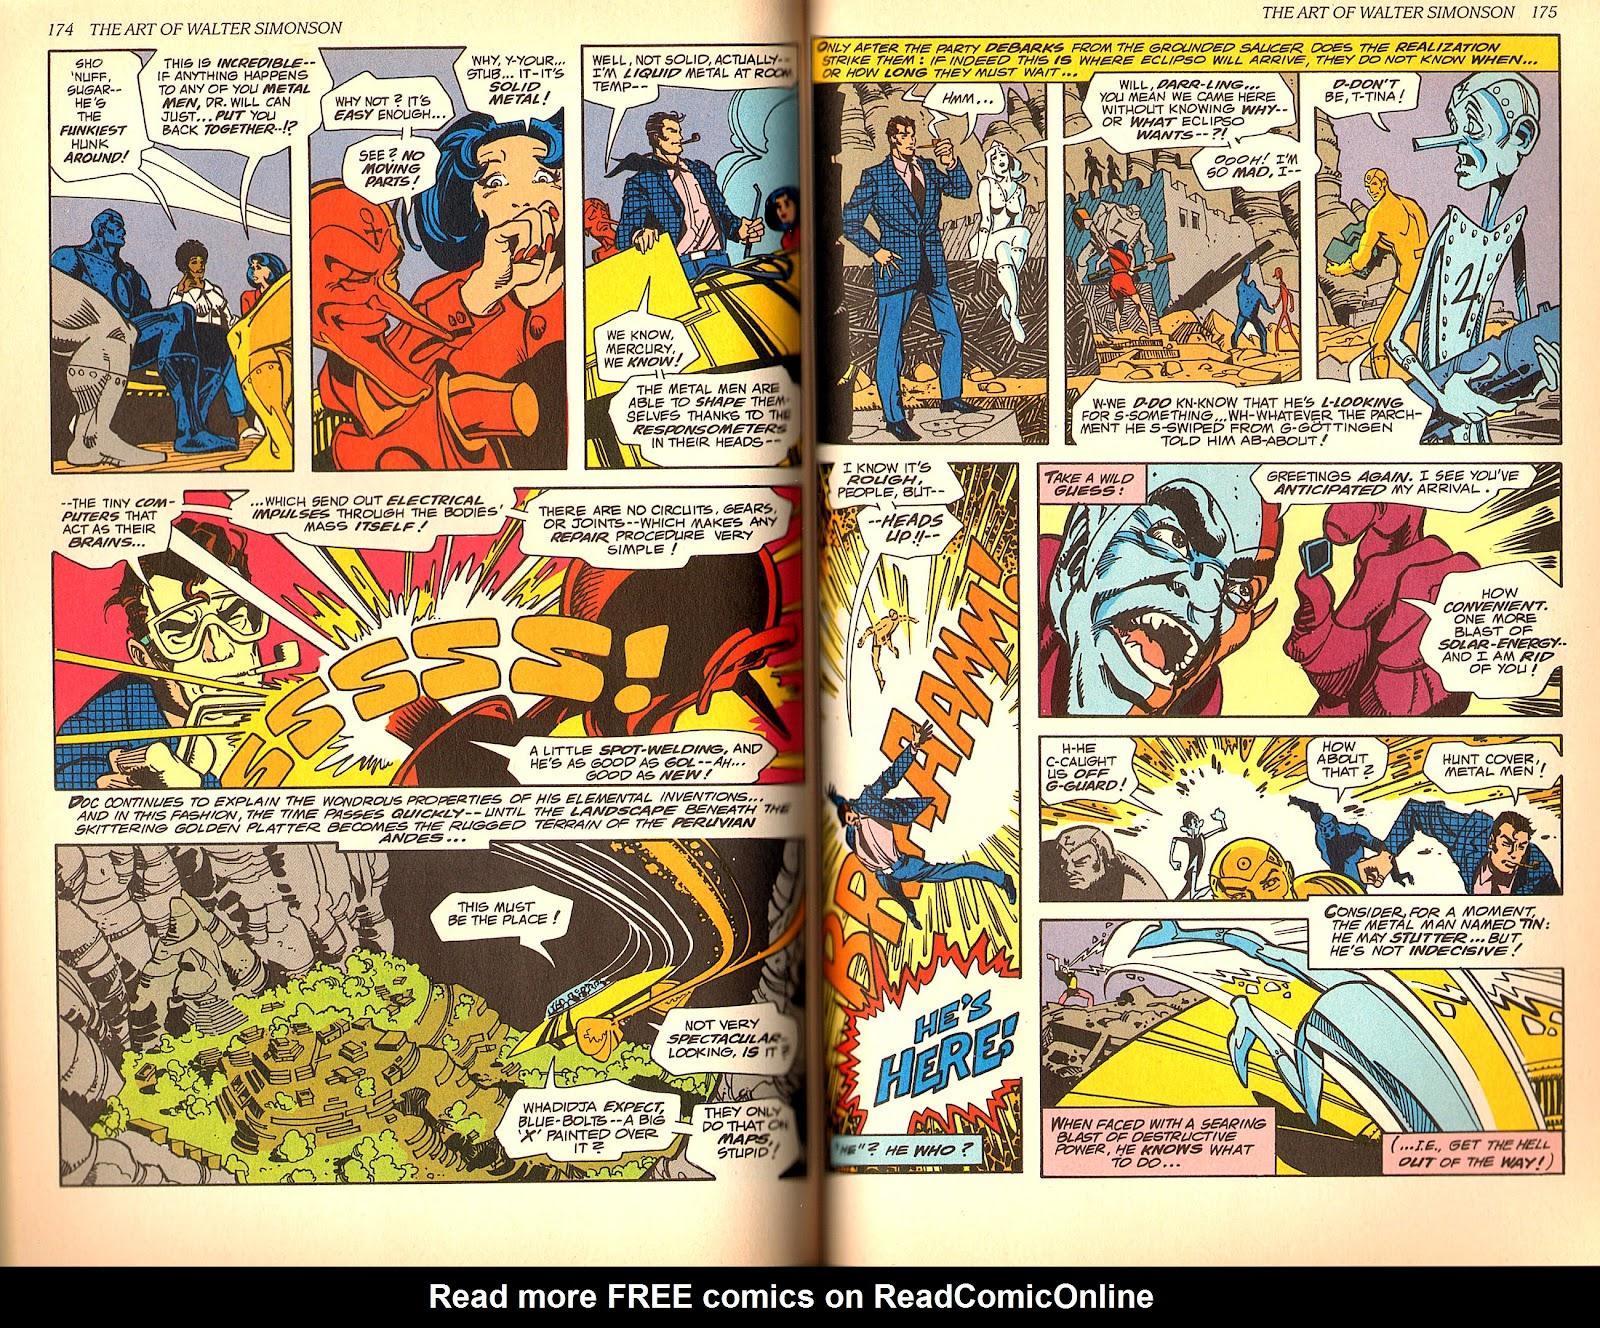 Read online The Art of Walter Simonson comic -  Issue # TPB - 89